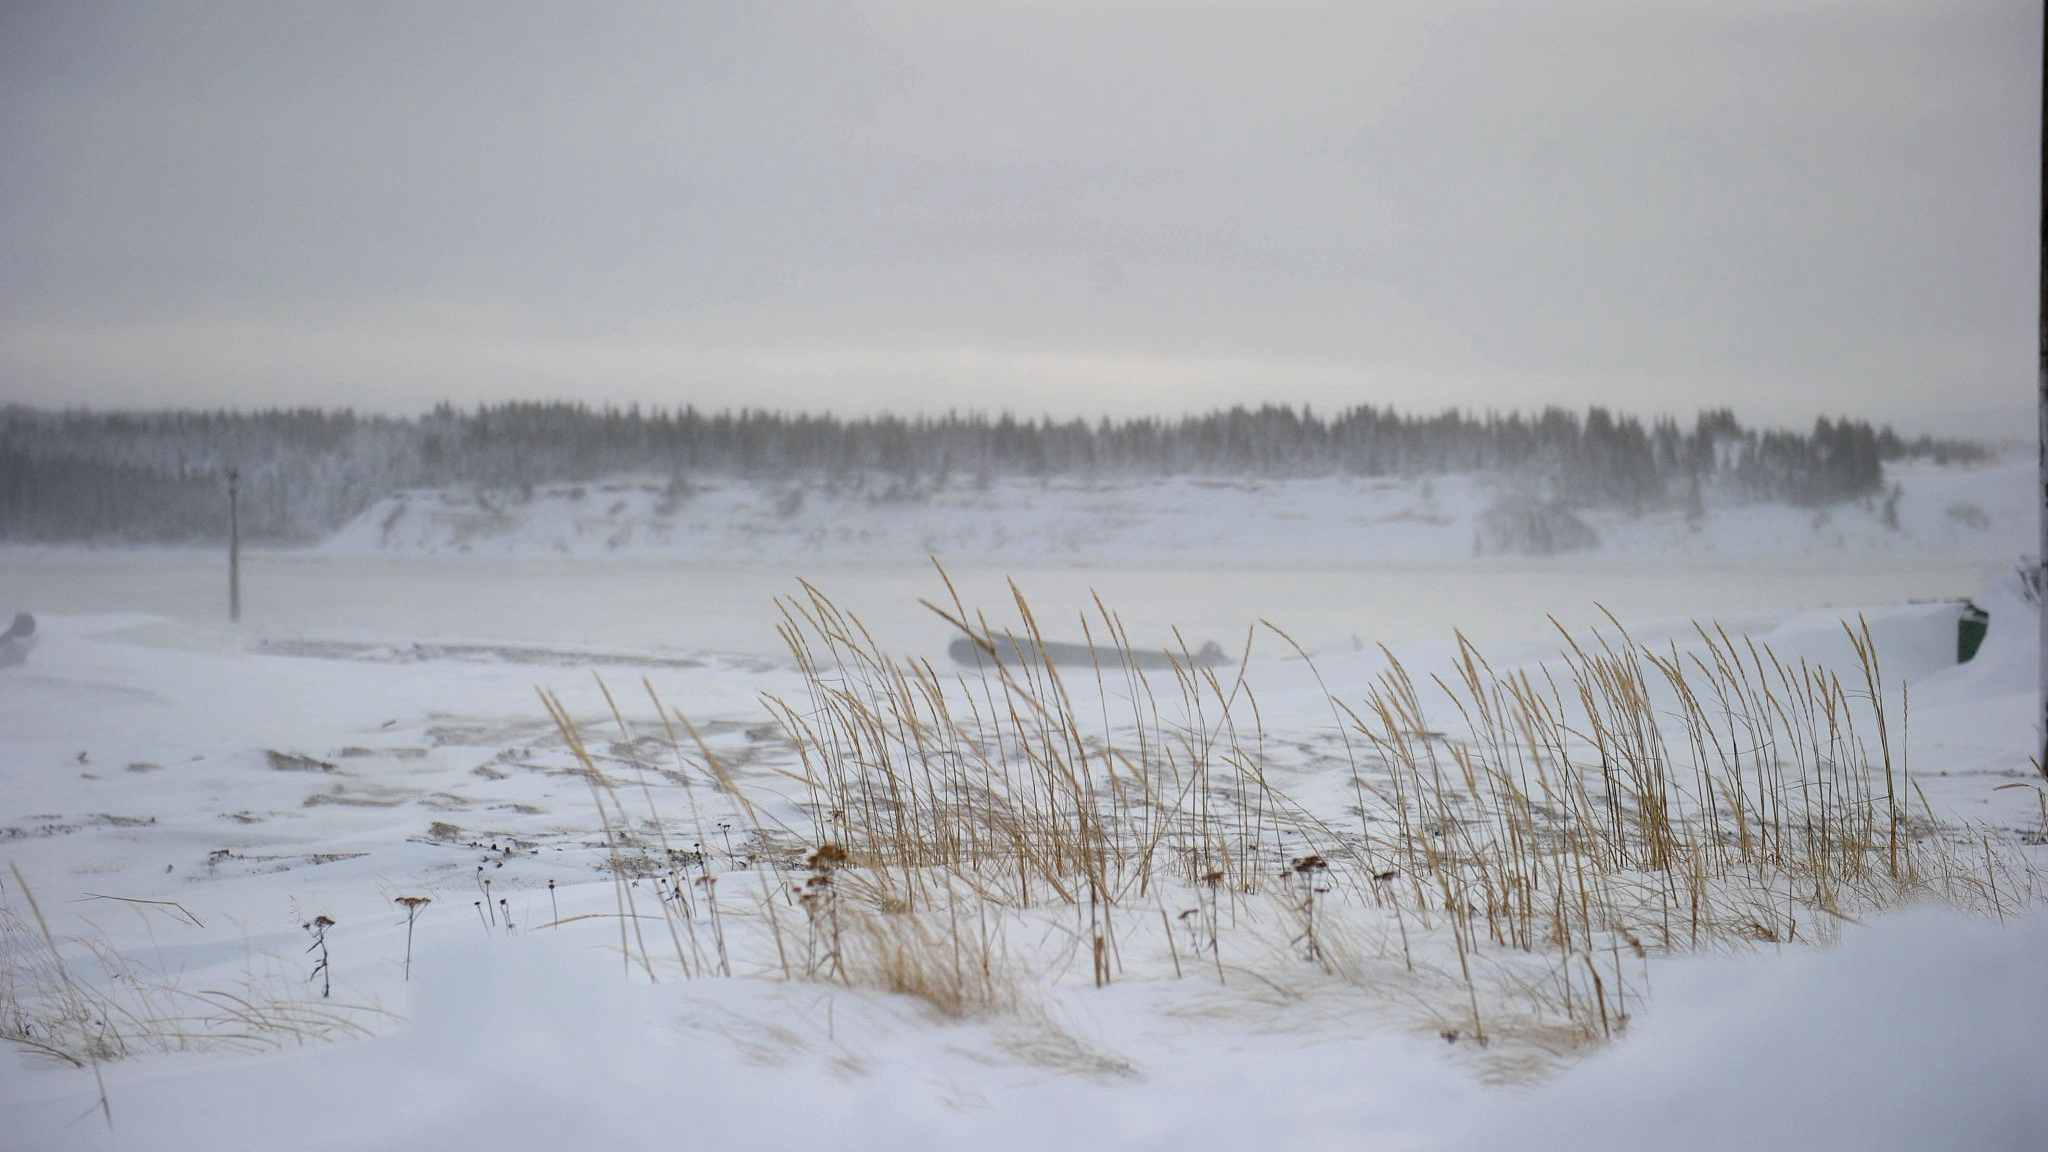 Rising temperatures change plant species in Arctic tundra: study